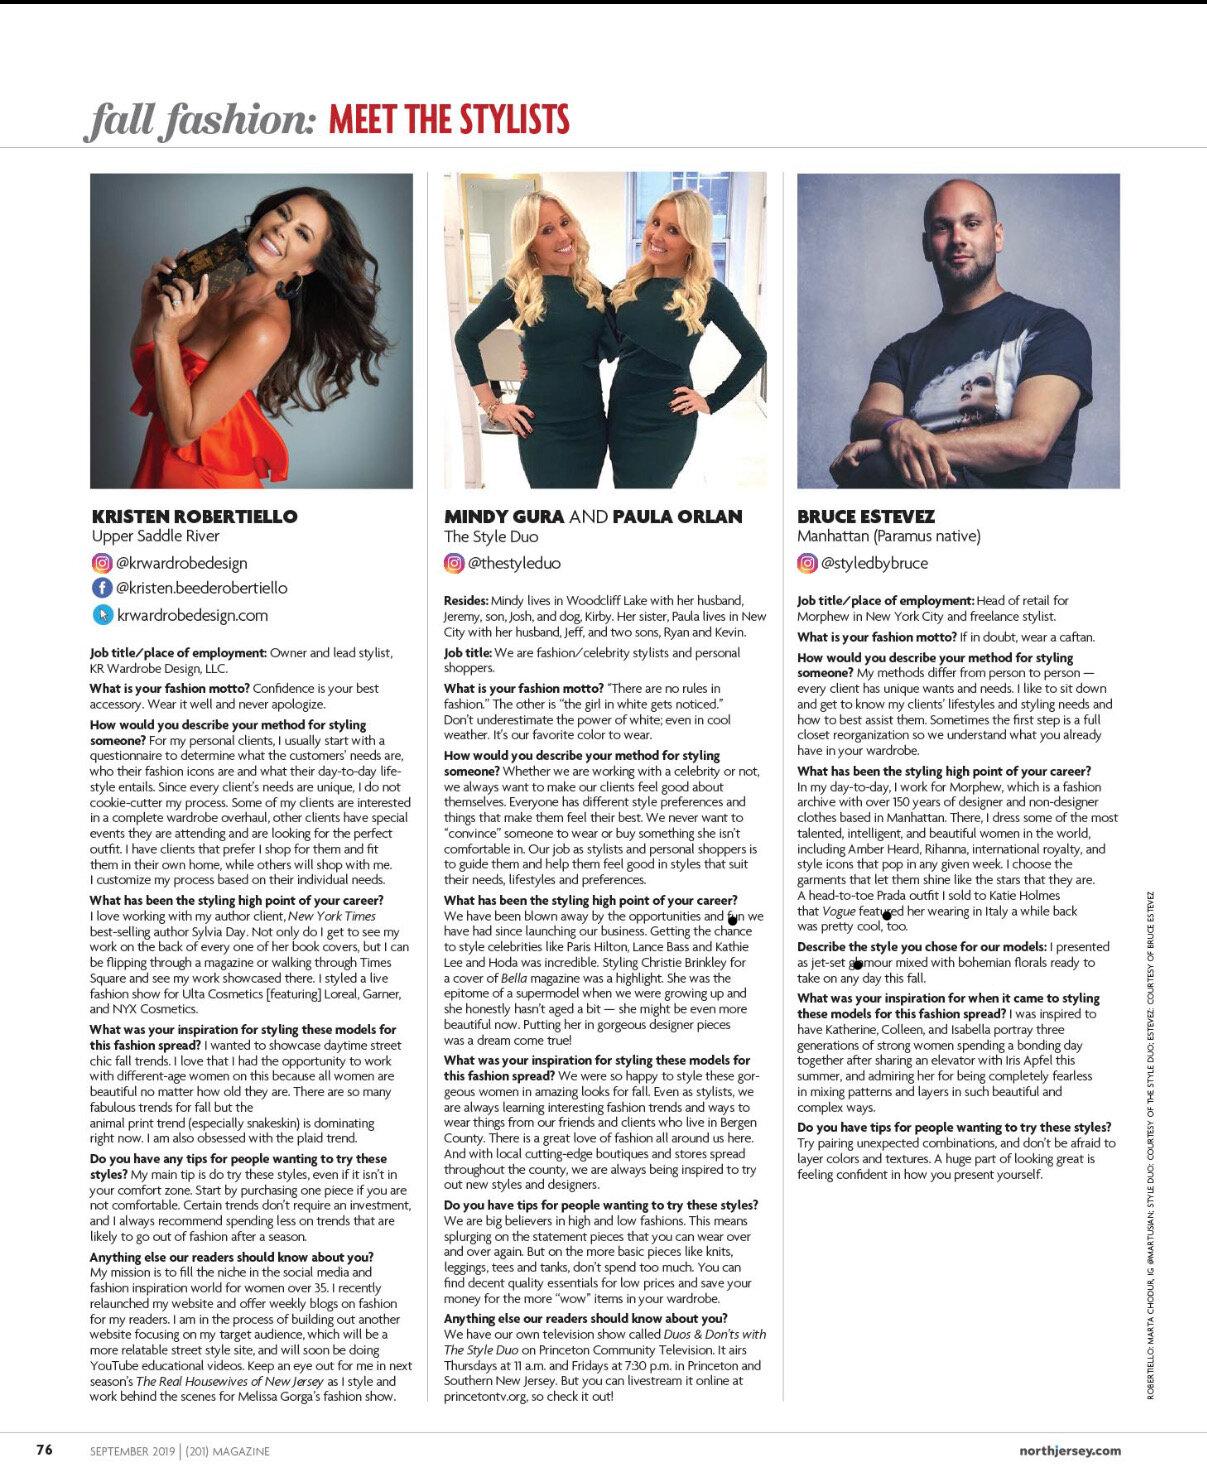 201_Magazine_Feature